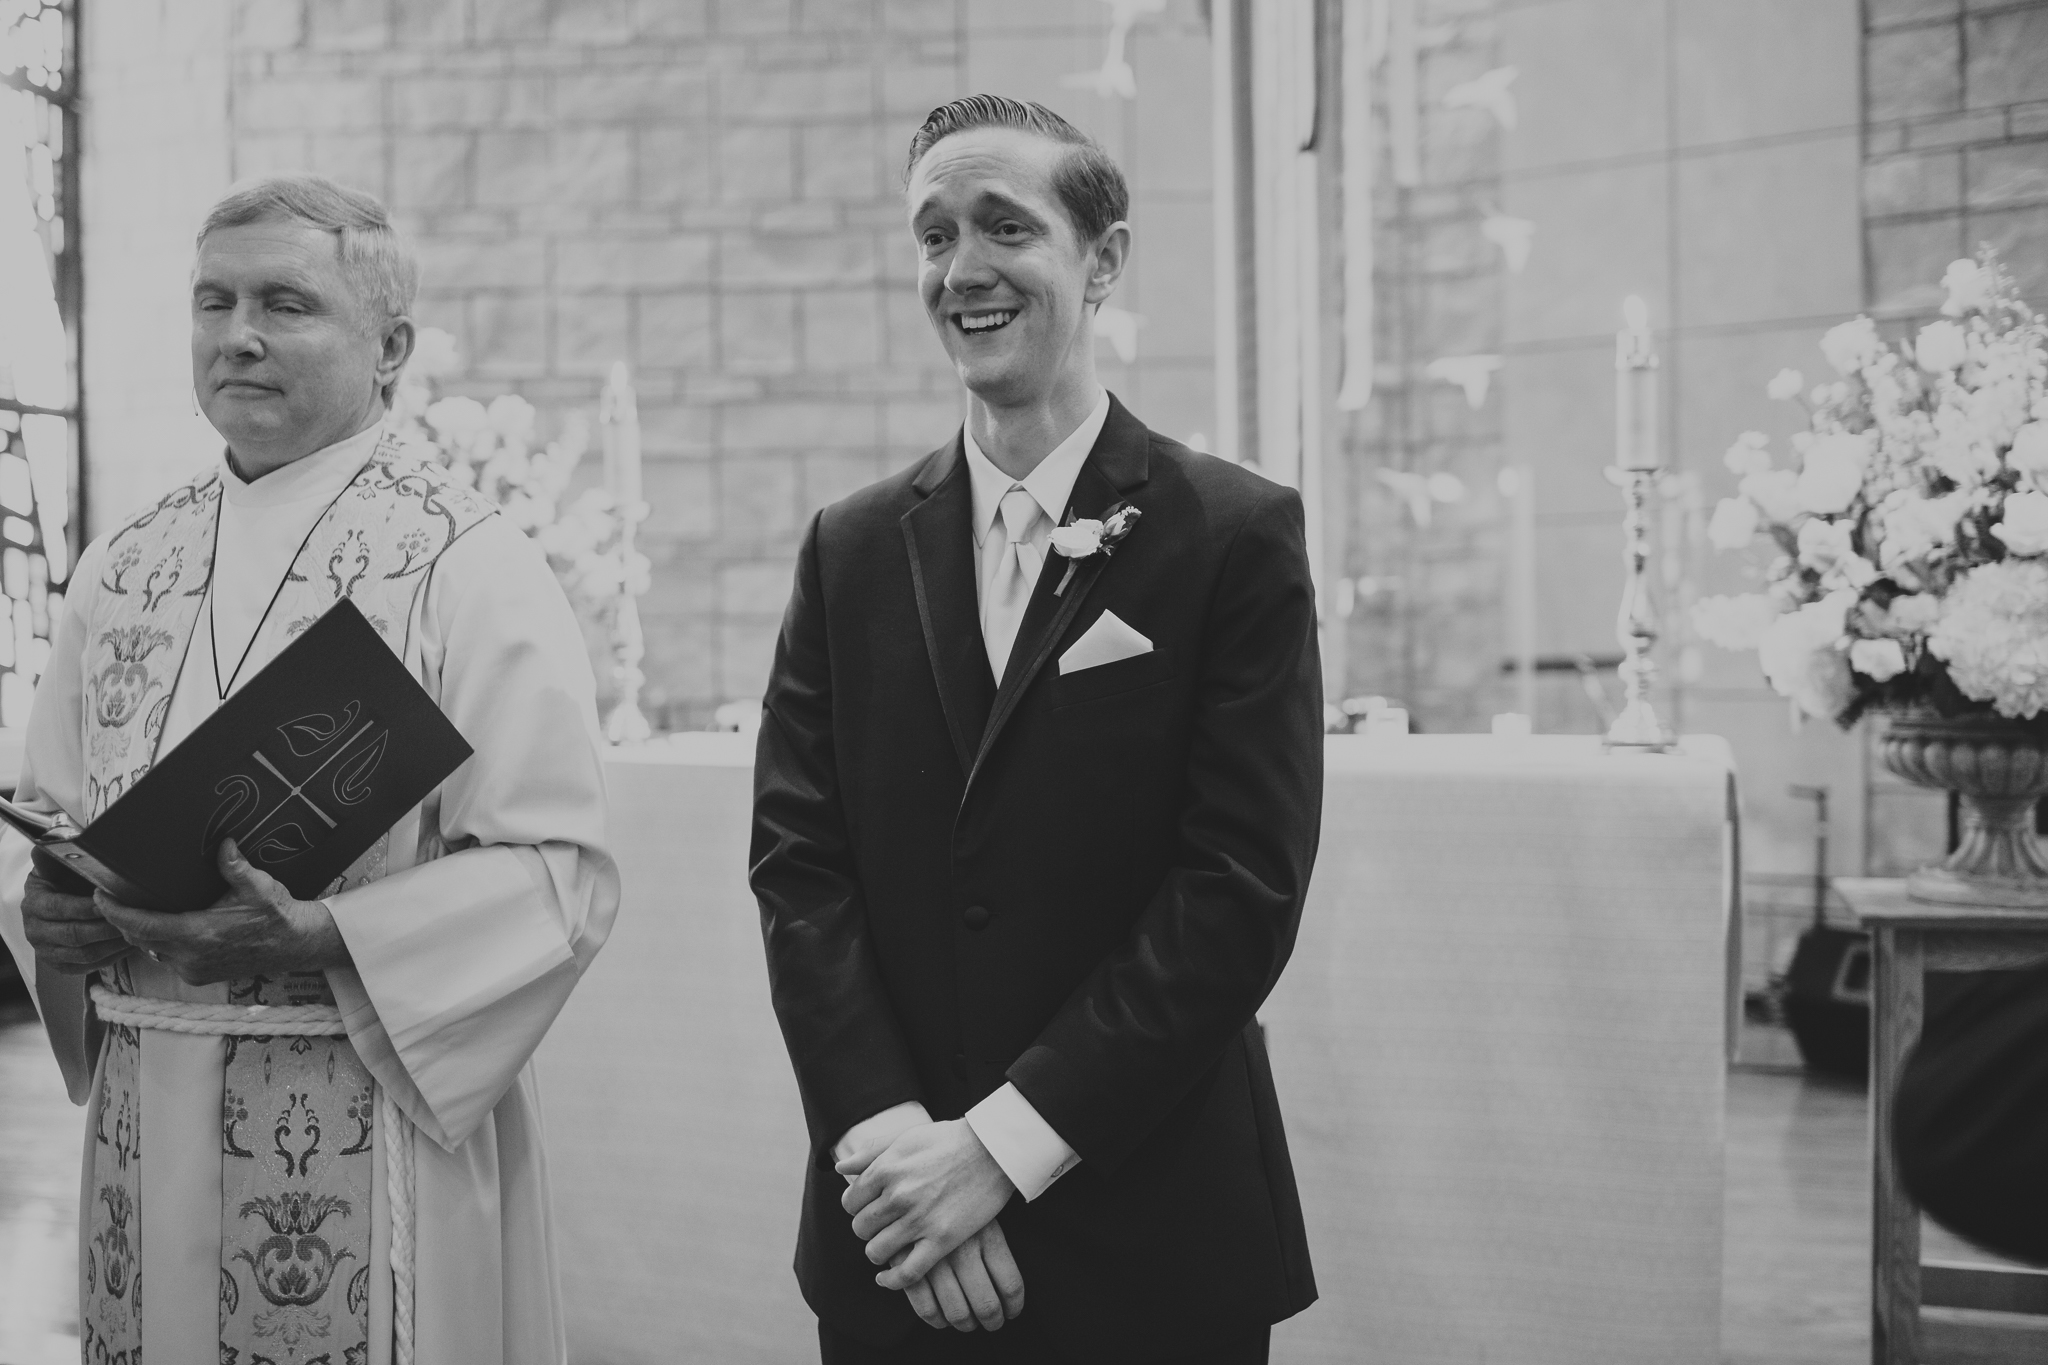 Michael and Kelly - the ashton depot - wedding DFW - wedding photographer- elizalde photography (29 of 150).jpg